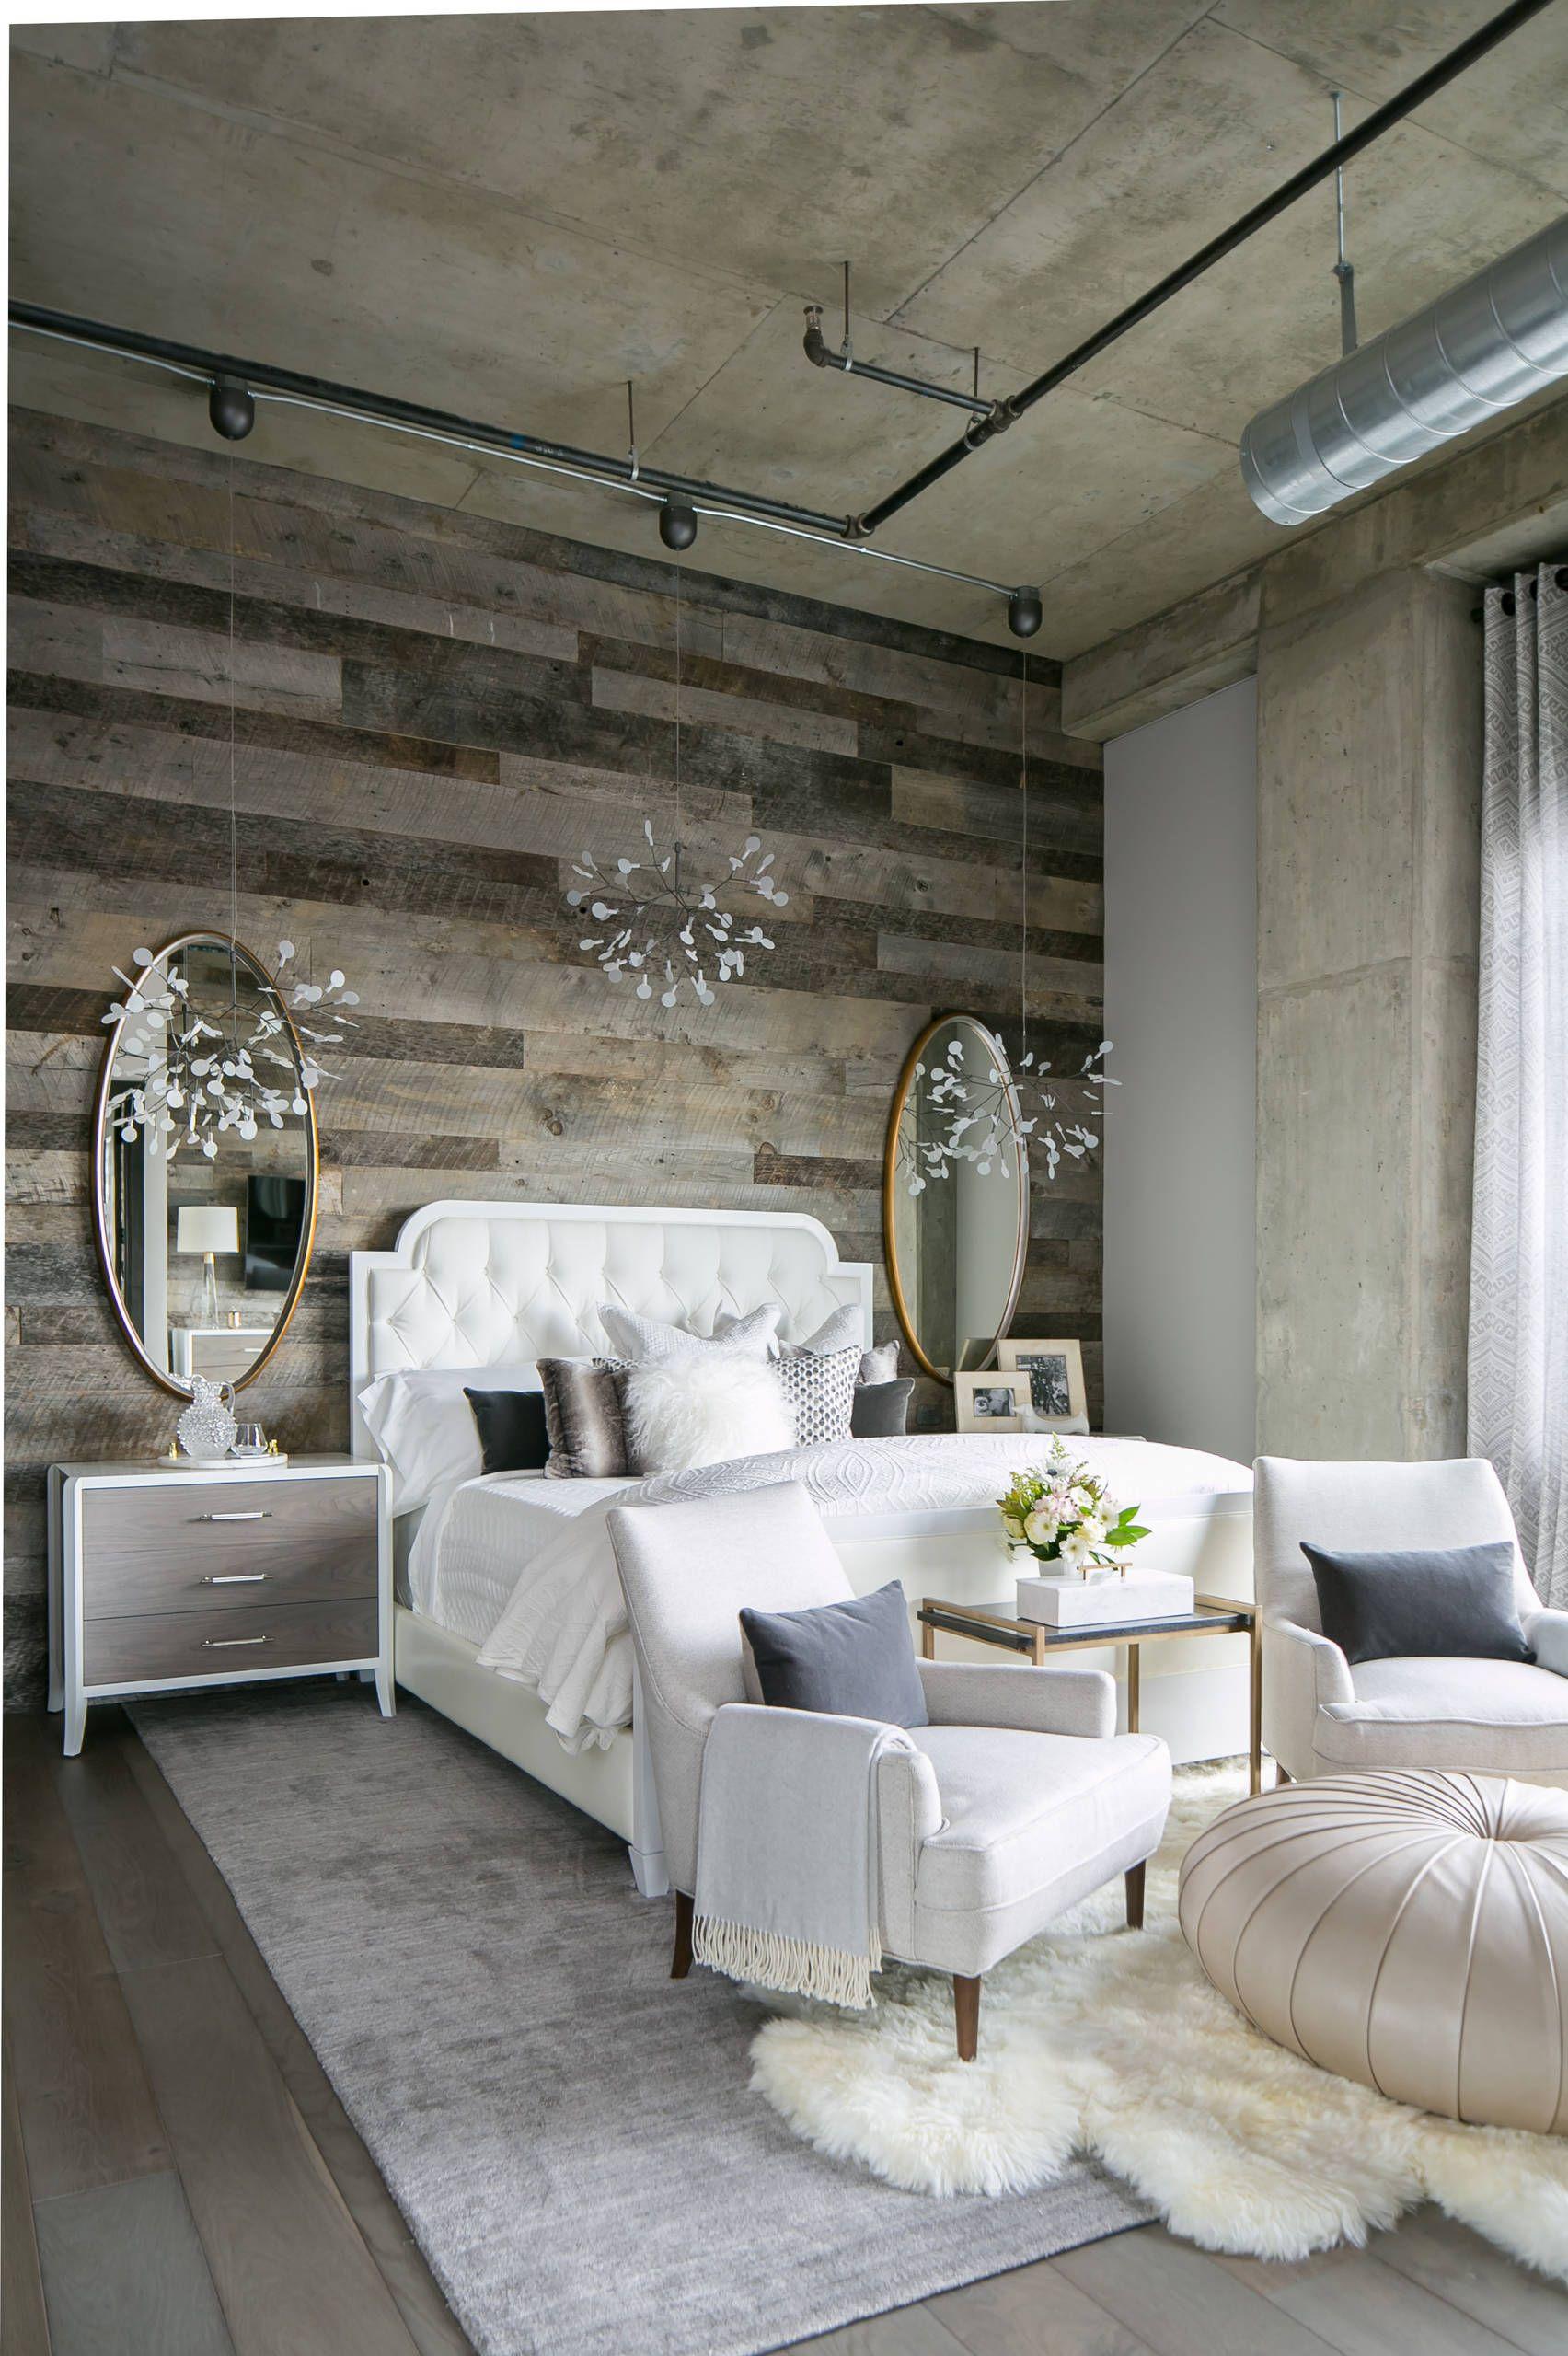 5 Easy Steps To Designing A Super Cozy Bedroom Loft Style Living Loft Style Master Bedroom Diy